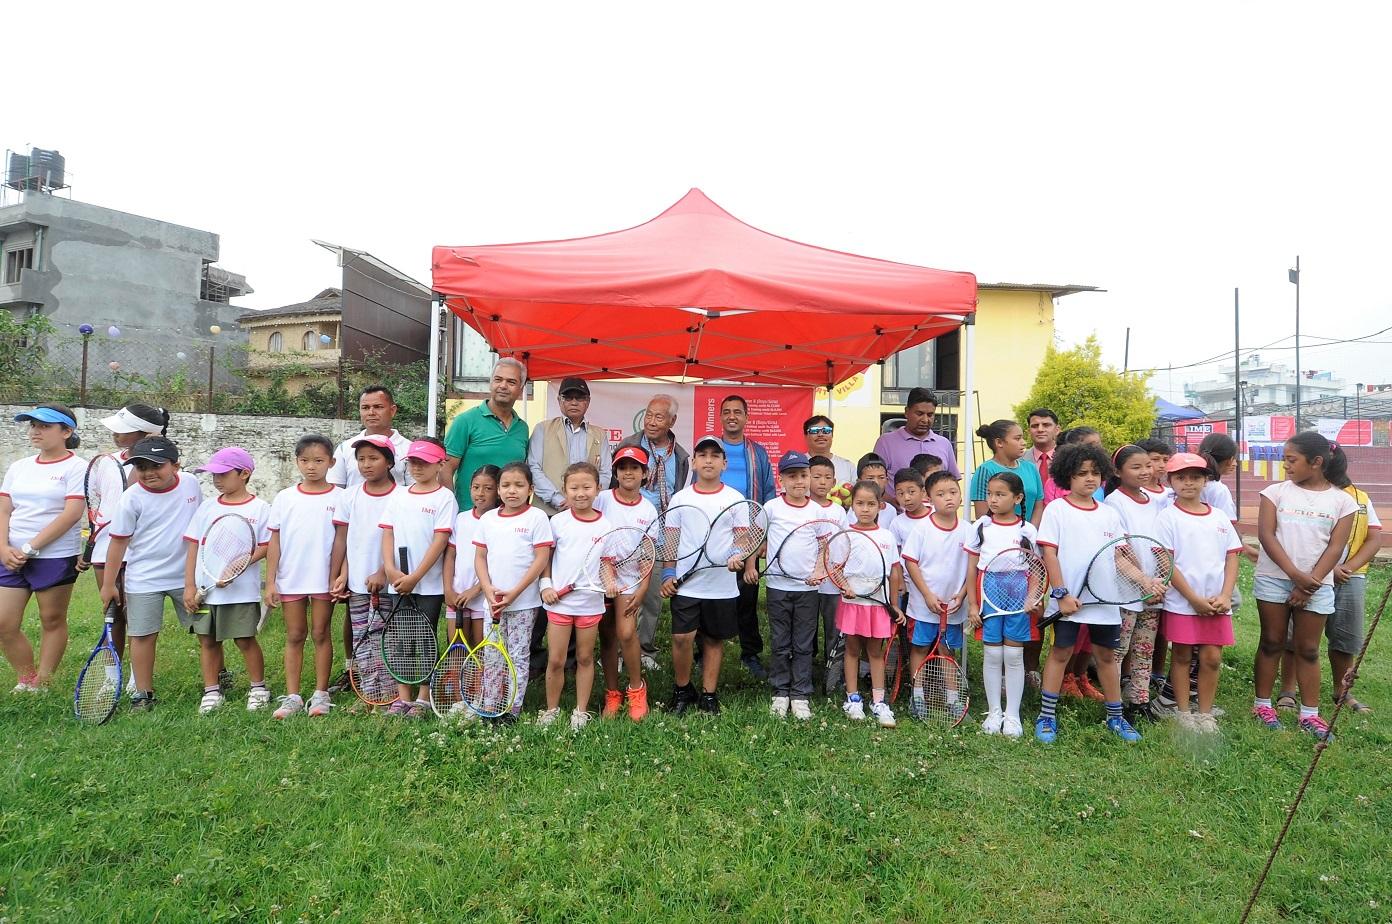 फस्ट आइएमई जेटीआई ग्राण्ड जुनियर ओपन लन टेनिस प्रतियोगिता सुरु